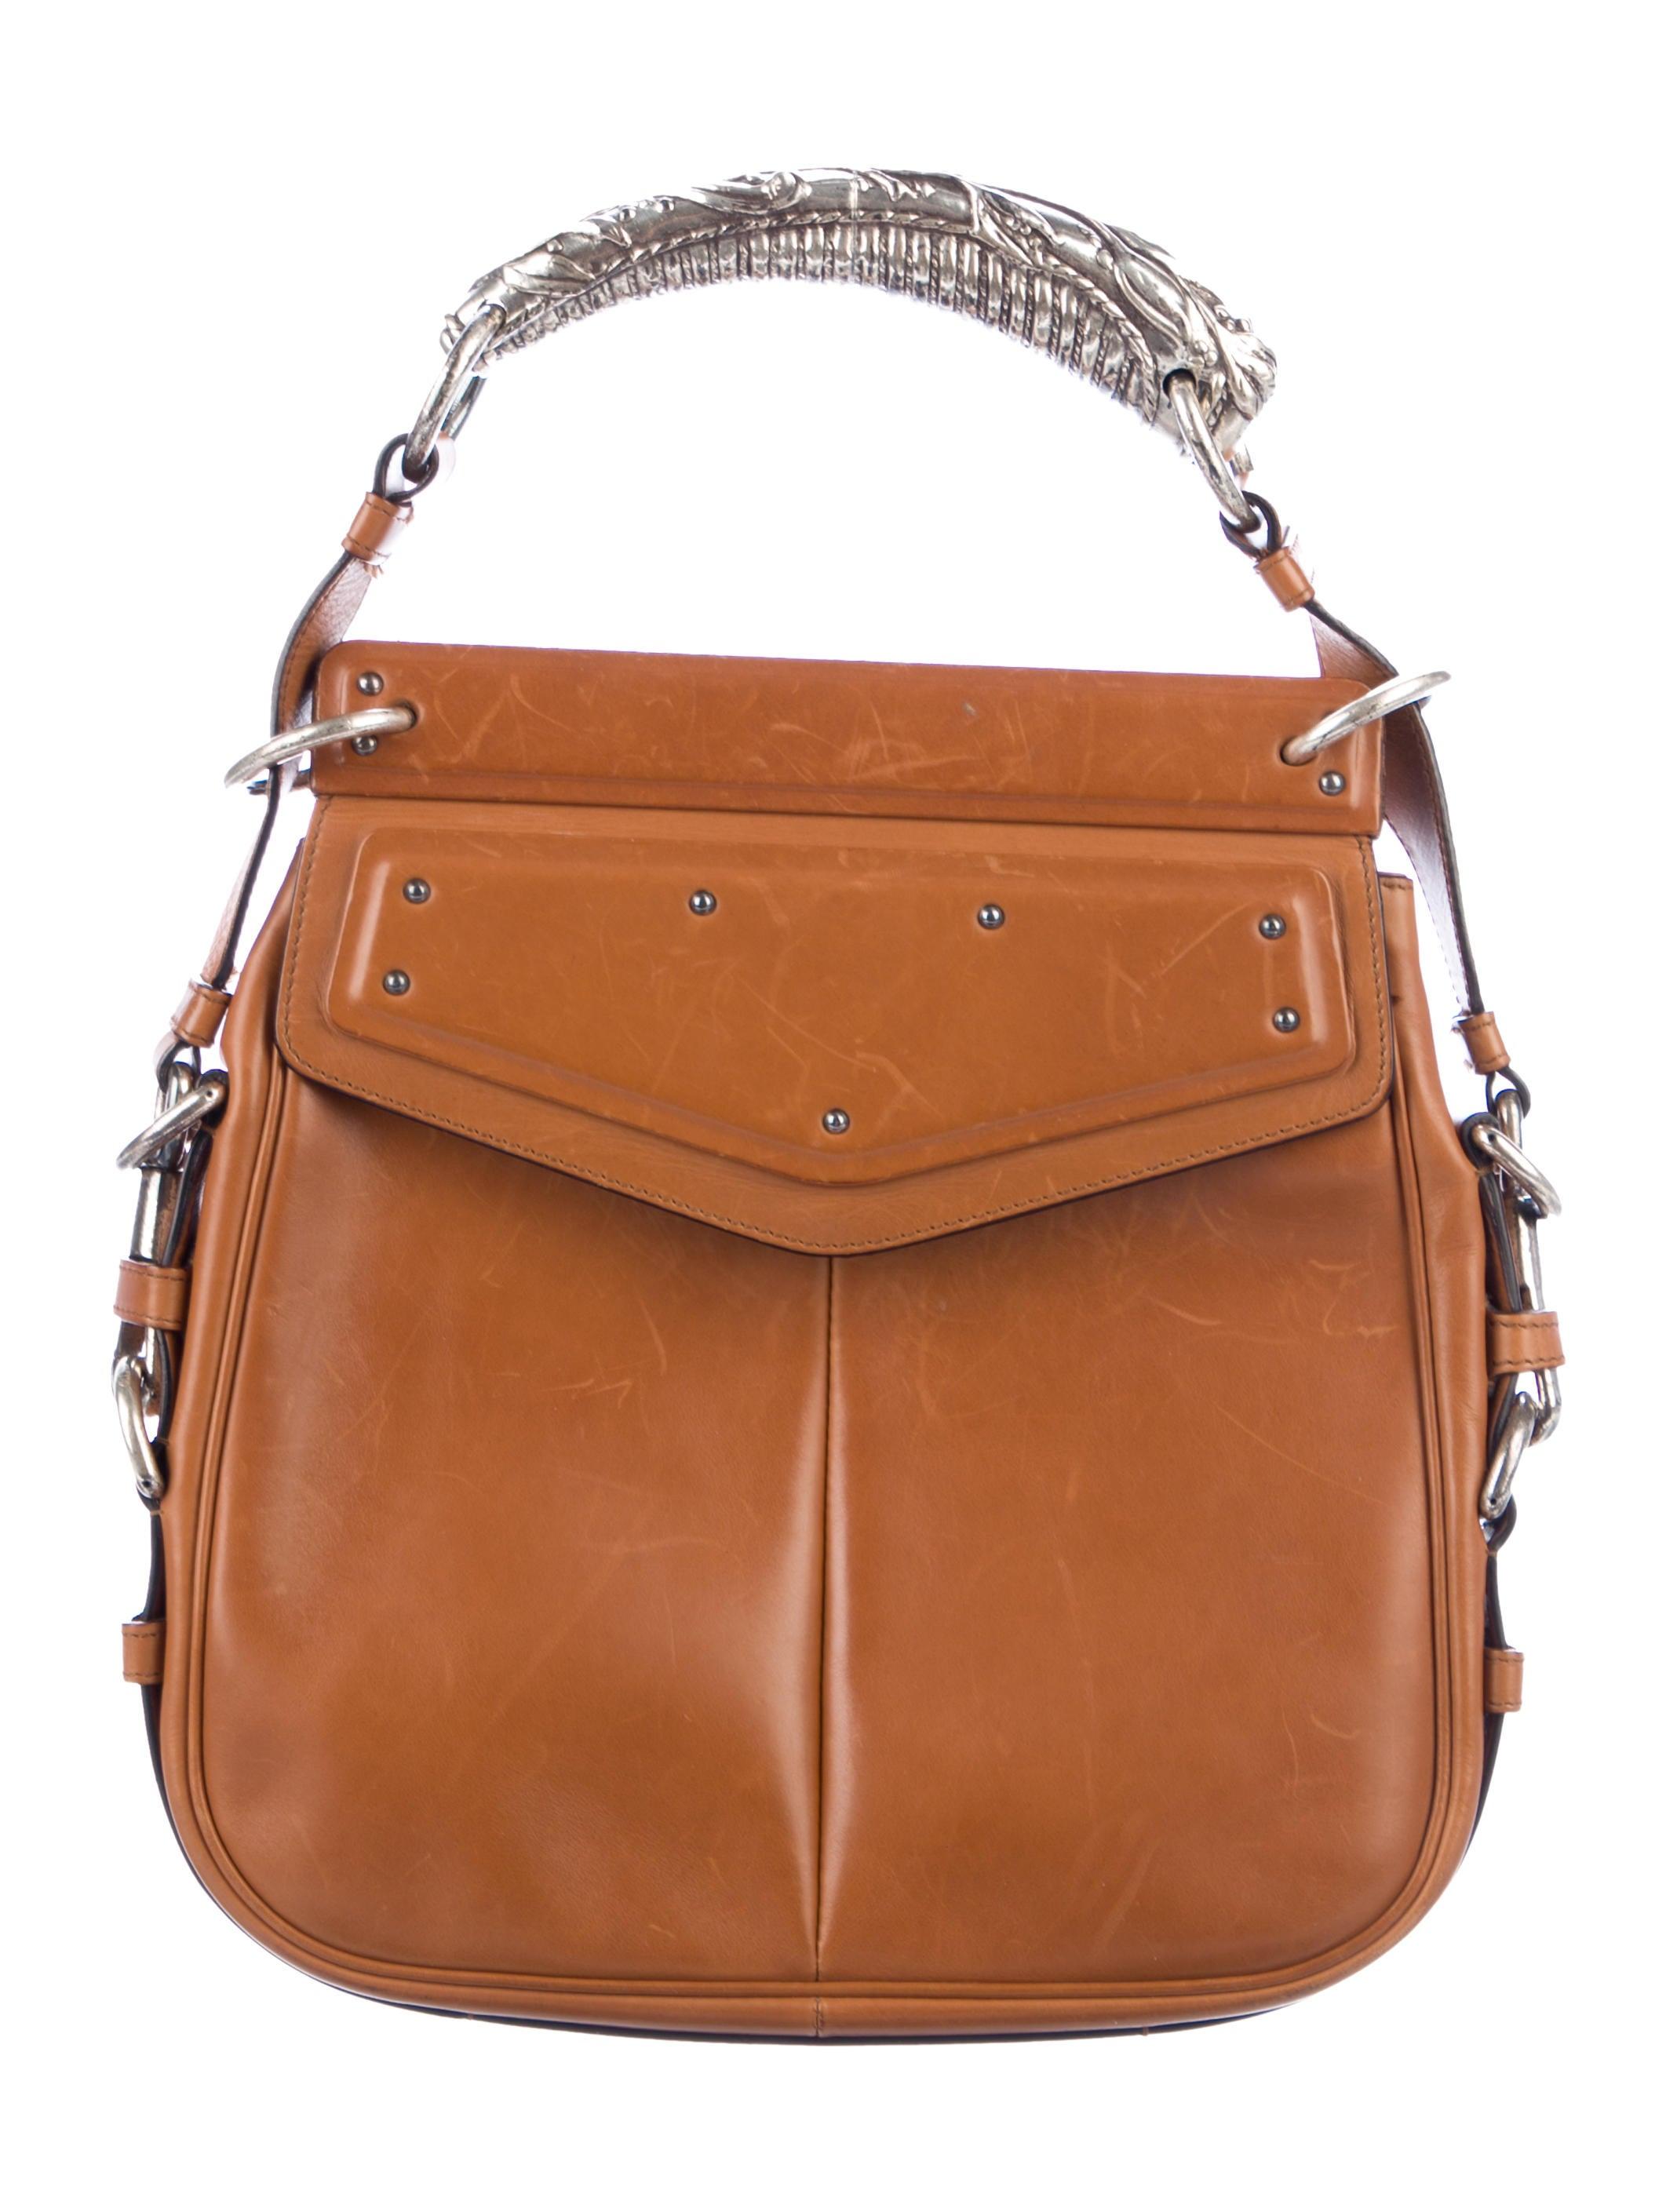 fa062a94c0dd Yves Saint Laurent Mombasa Flap Bag - Handbags - YVE87322